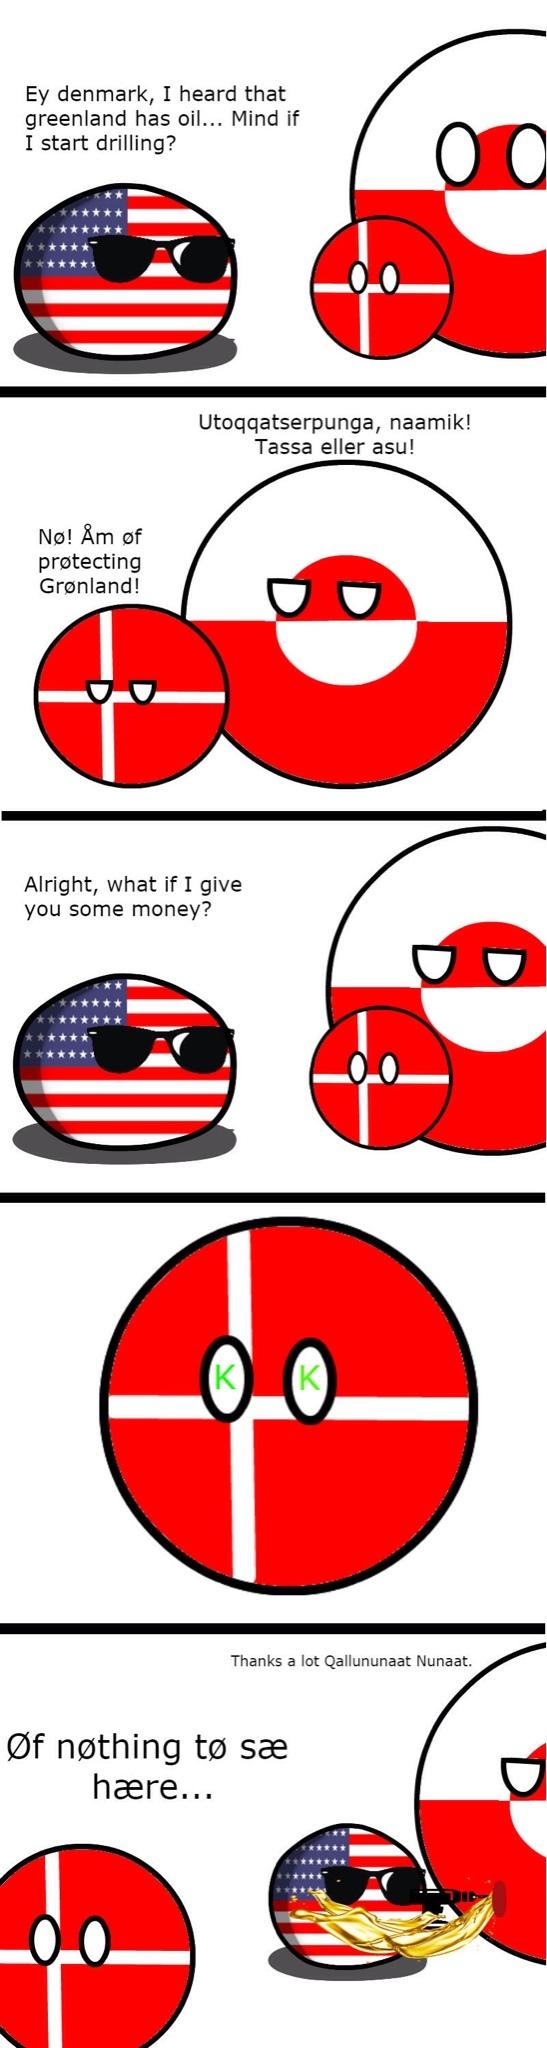 America drilling in greenland in a nutshell - meme